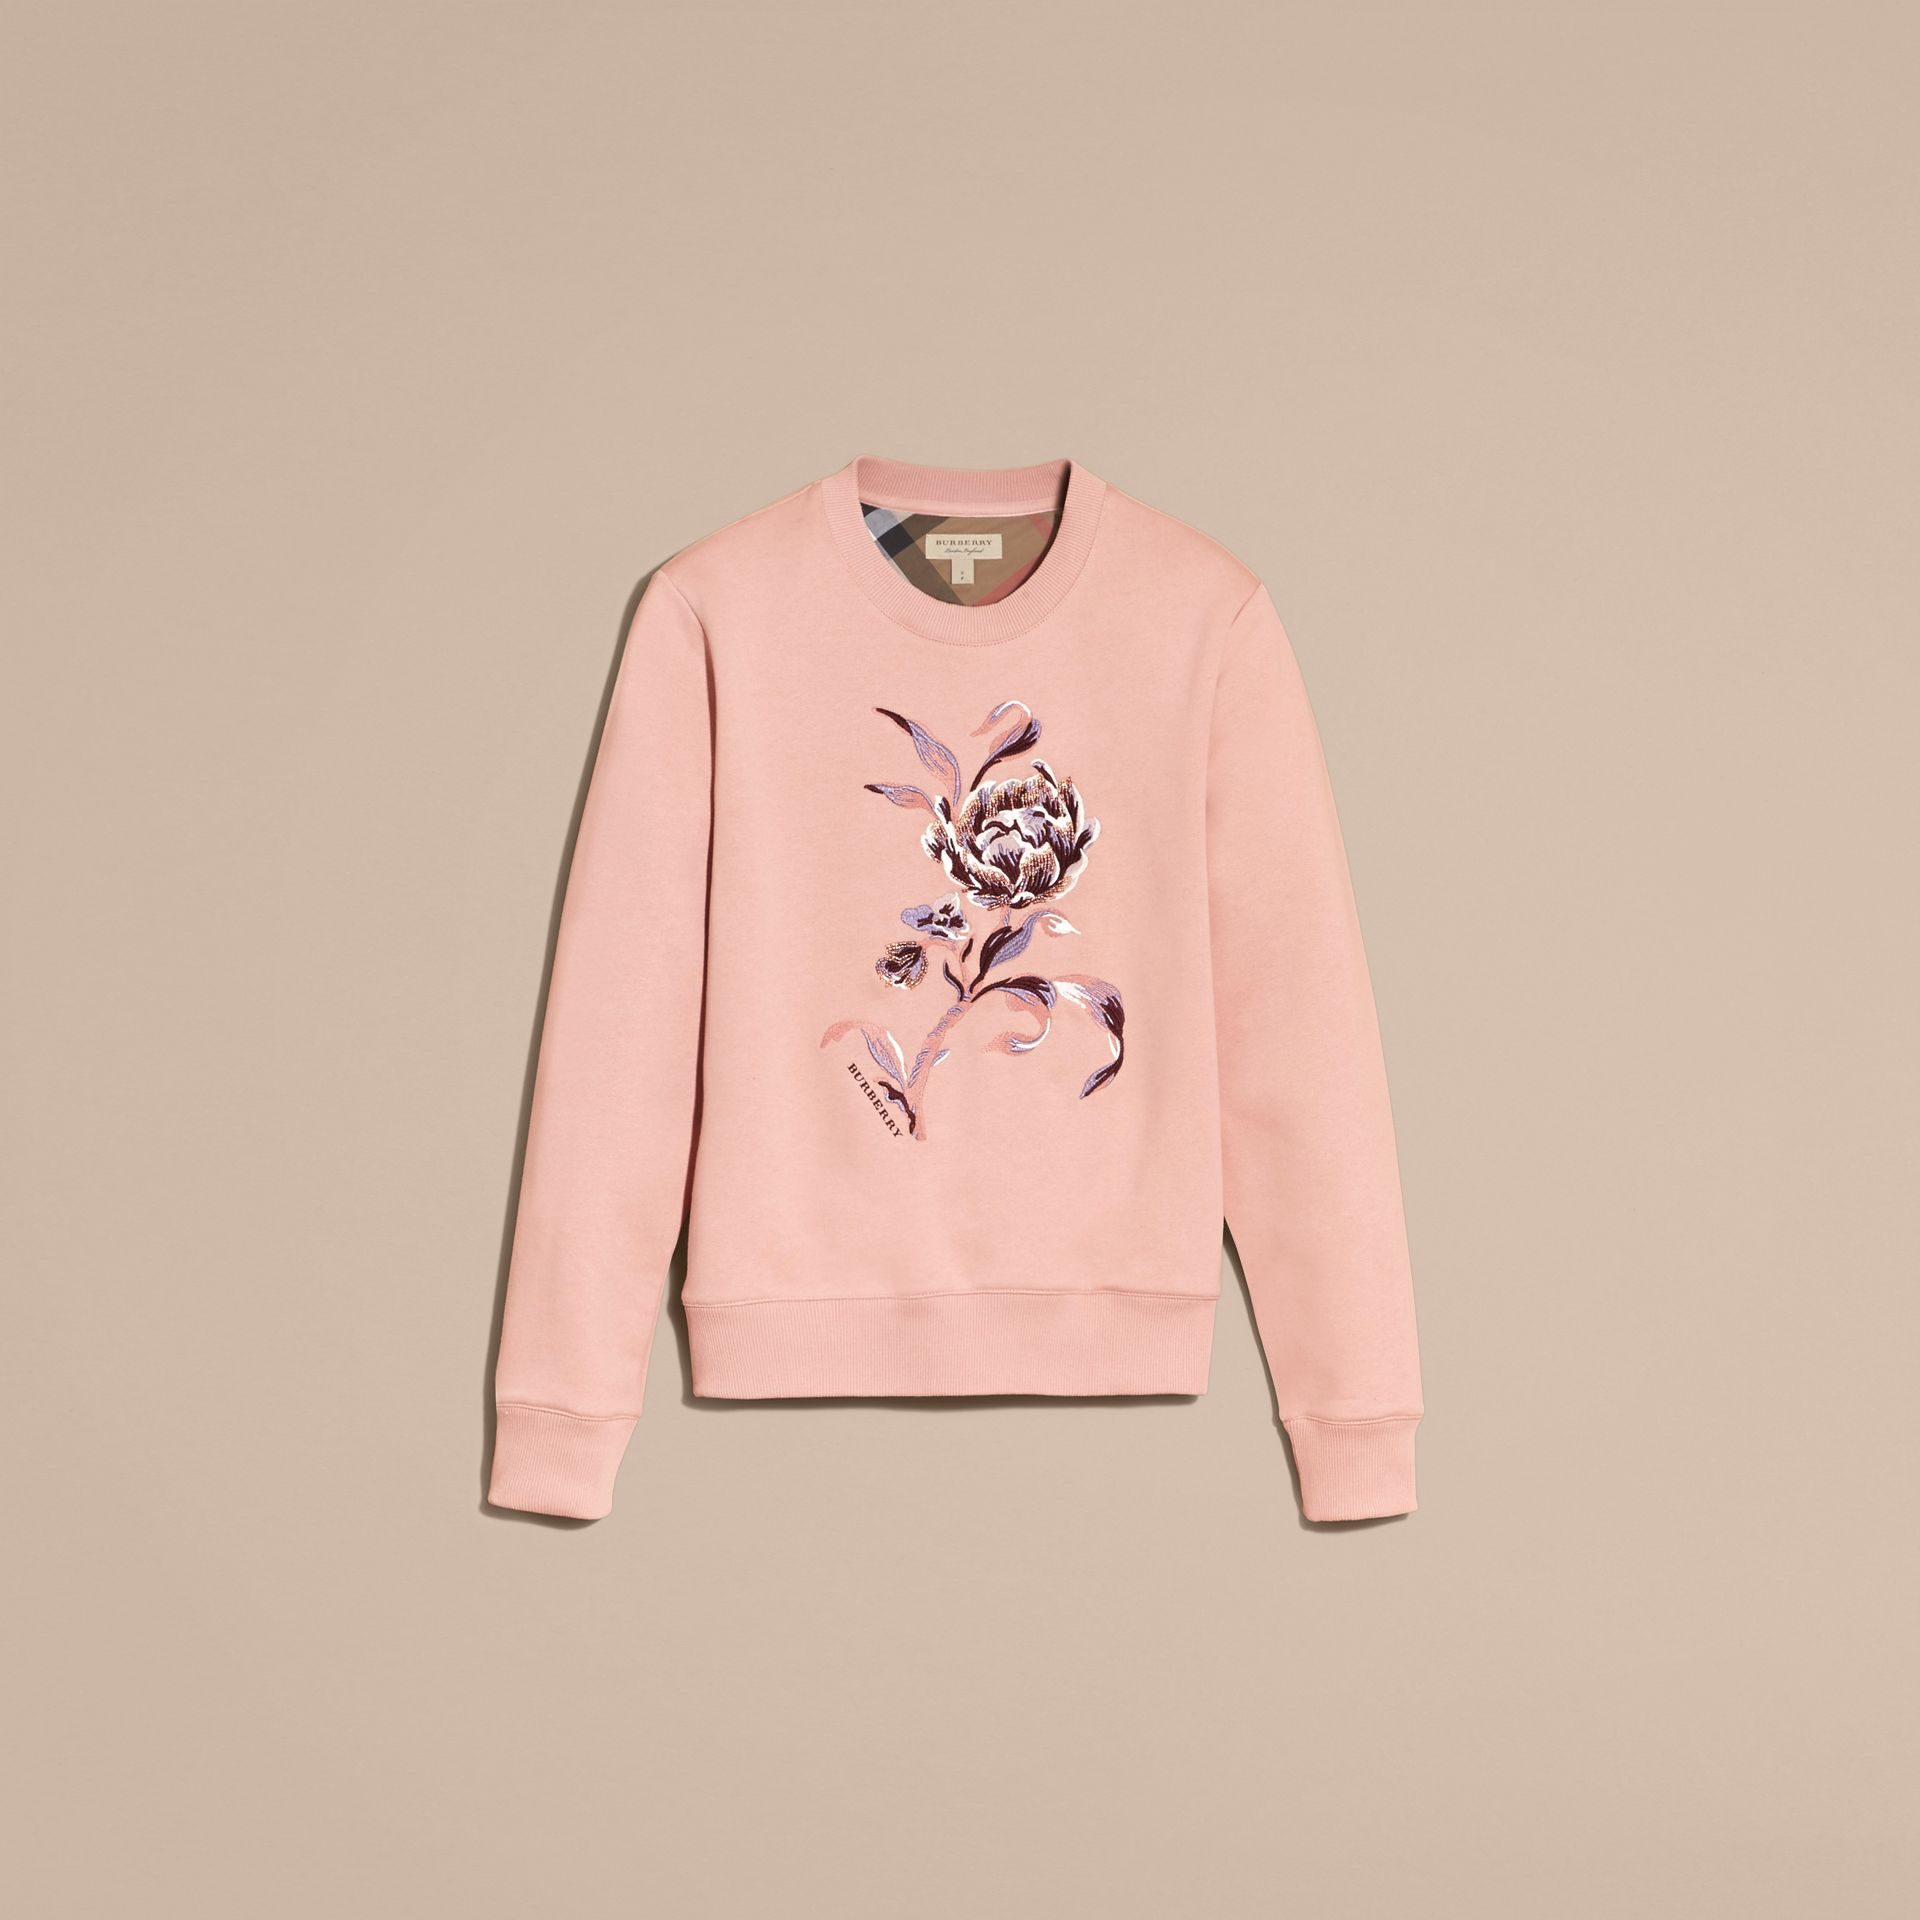 Embroidered Floral Motif Cotton Blend Sweatshirt Ash Rose - gallery image 4